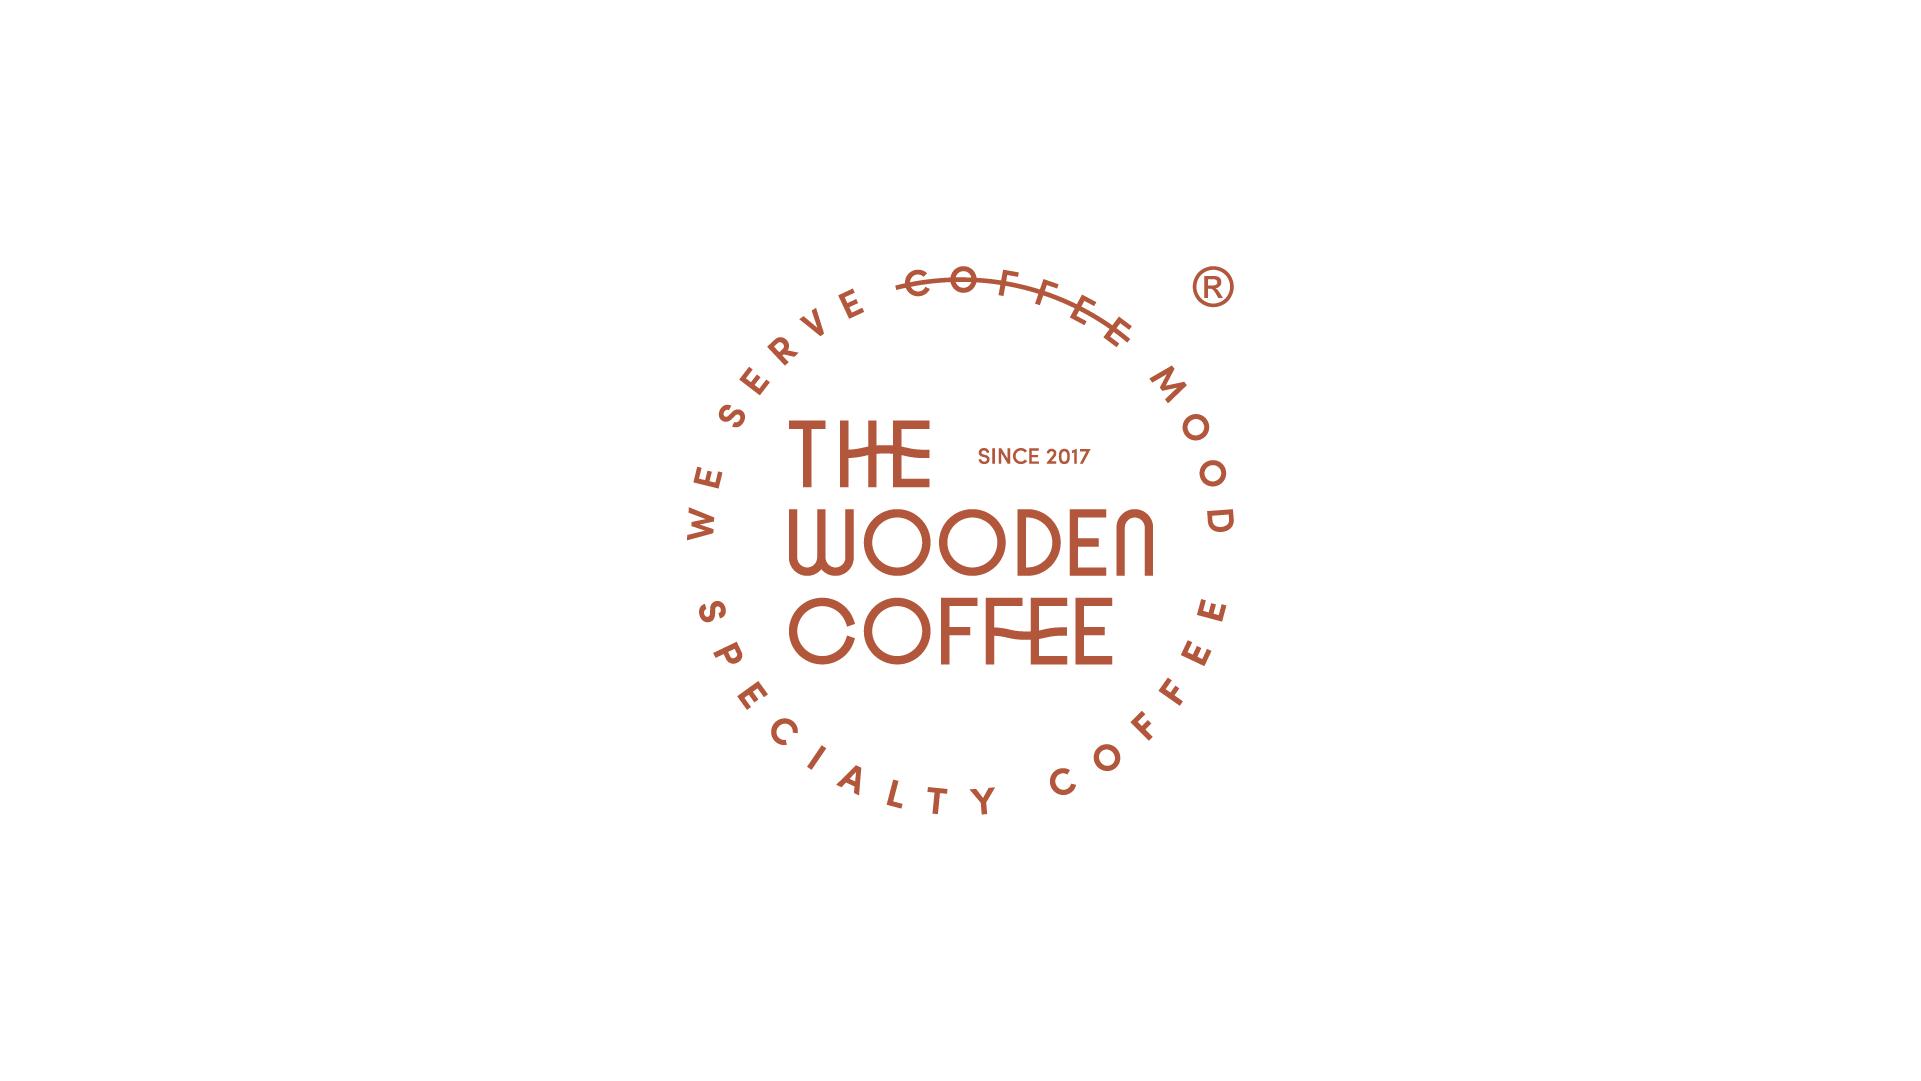 Logo-WoodenCoffee-Work-by-YaStudio-1